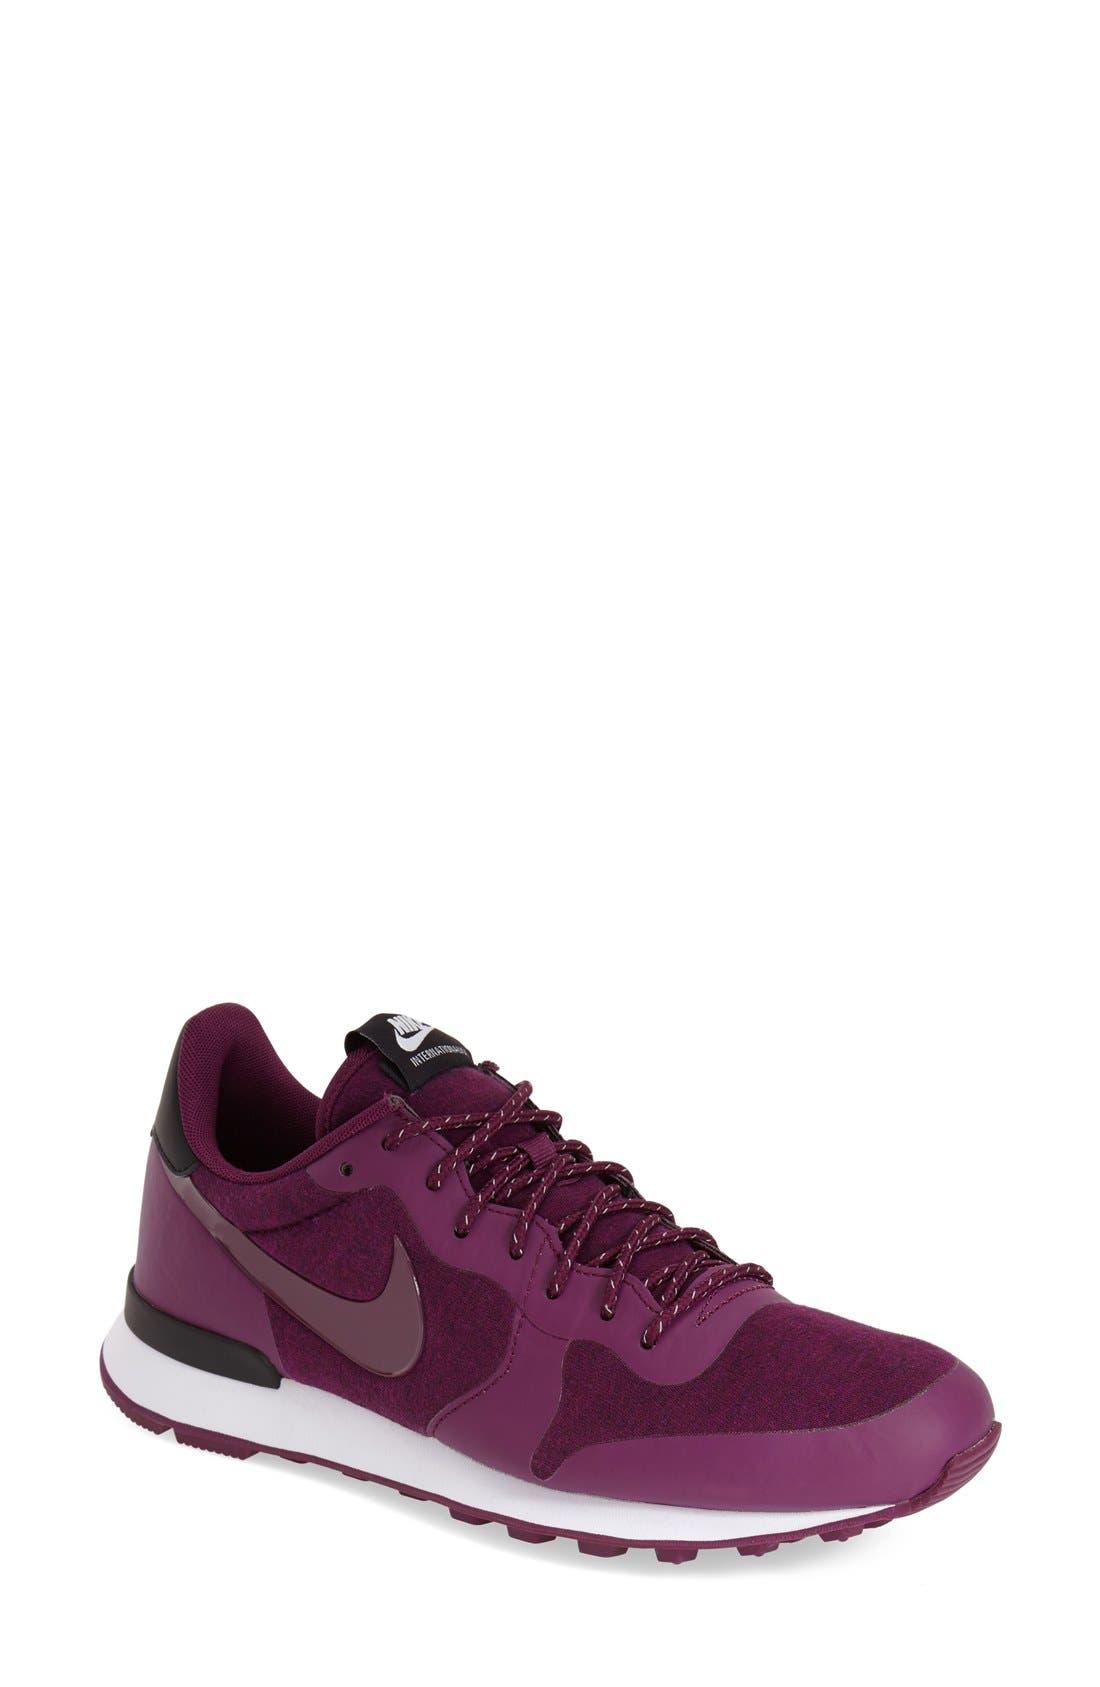 Main Image - Nike 'International' Sneaker (Women)